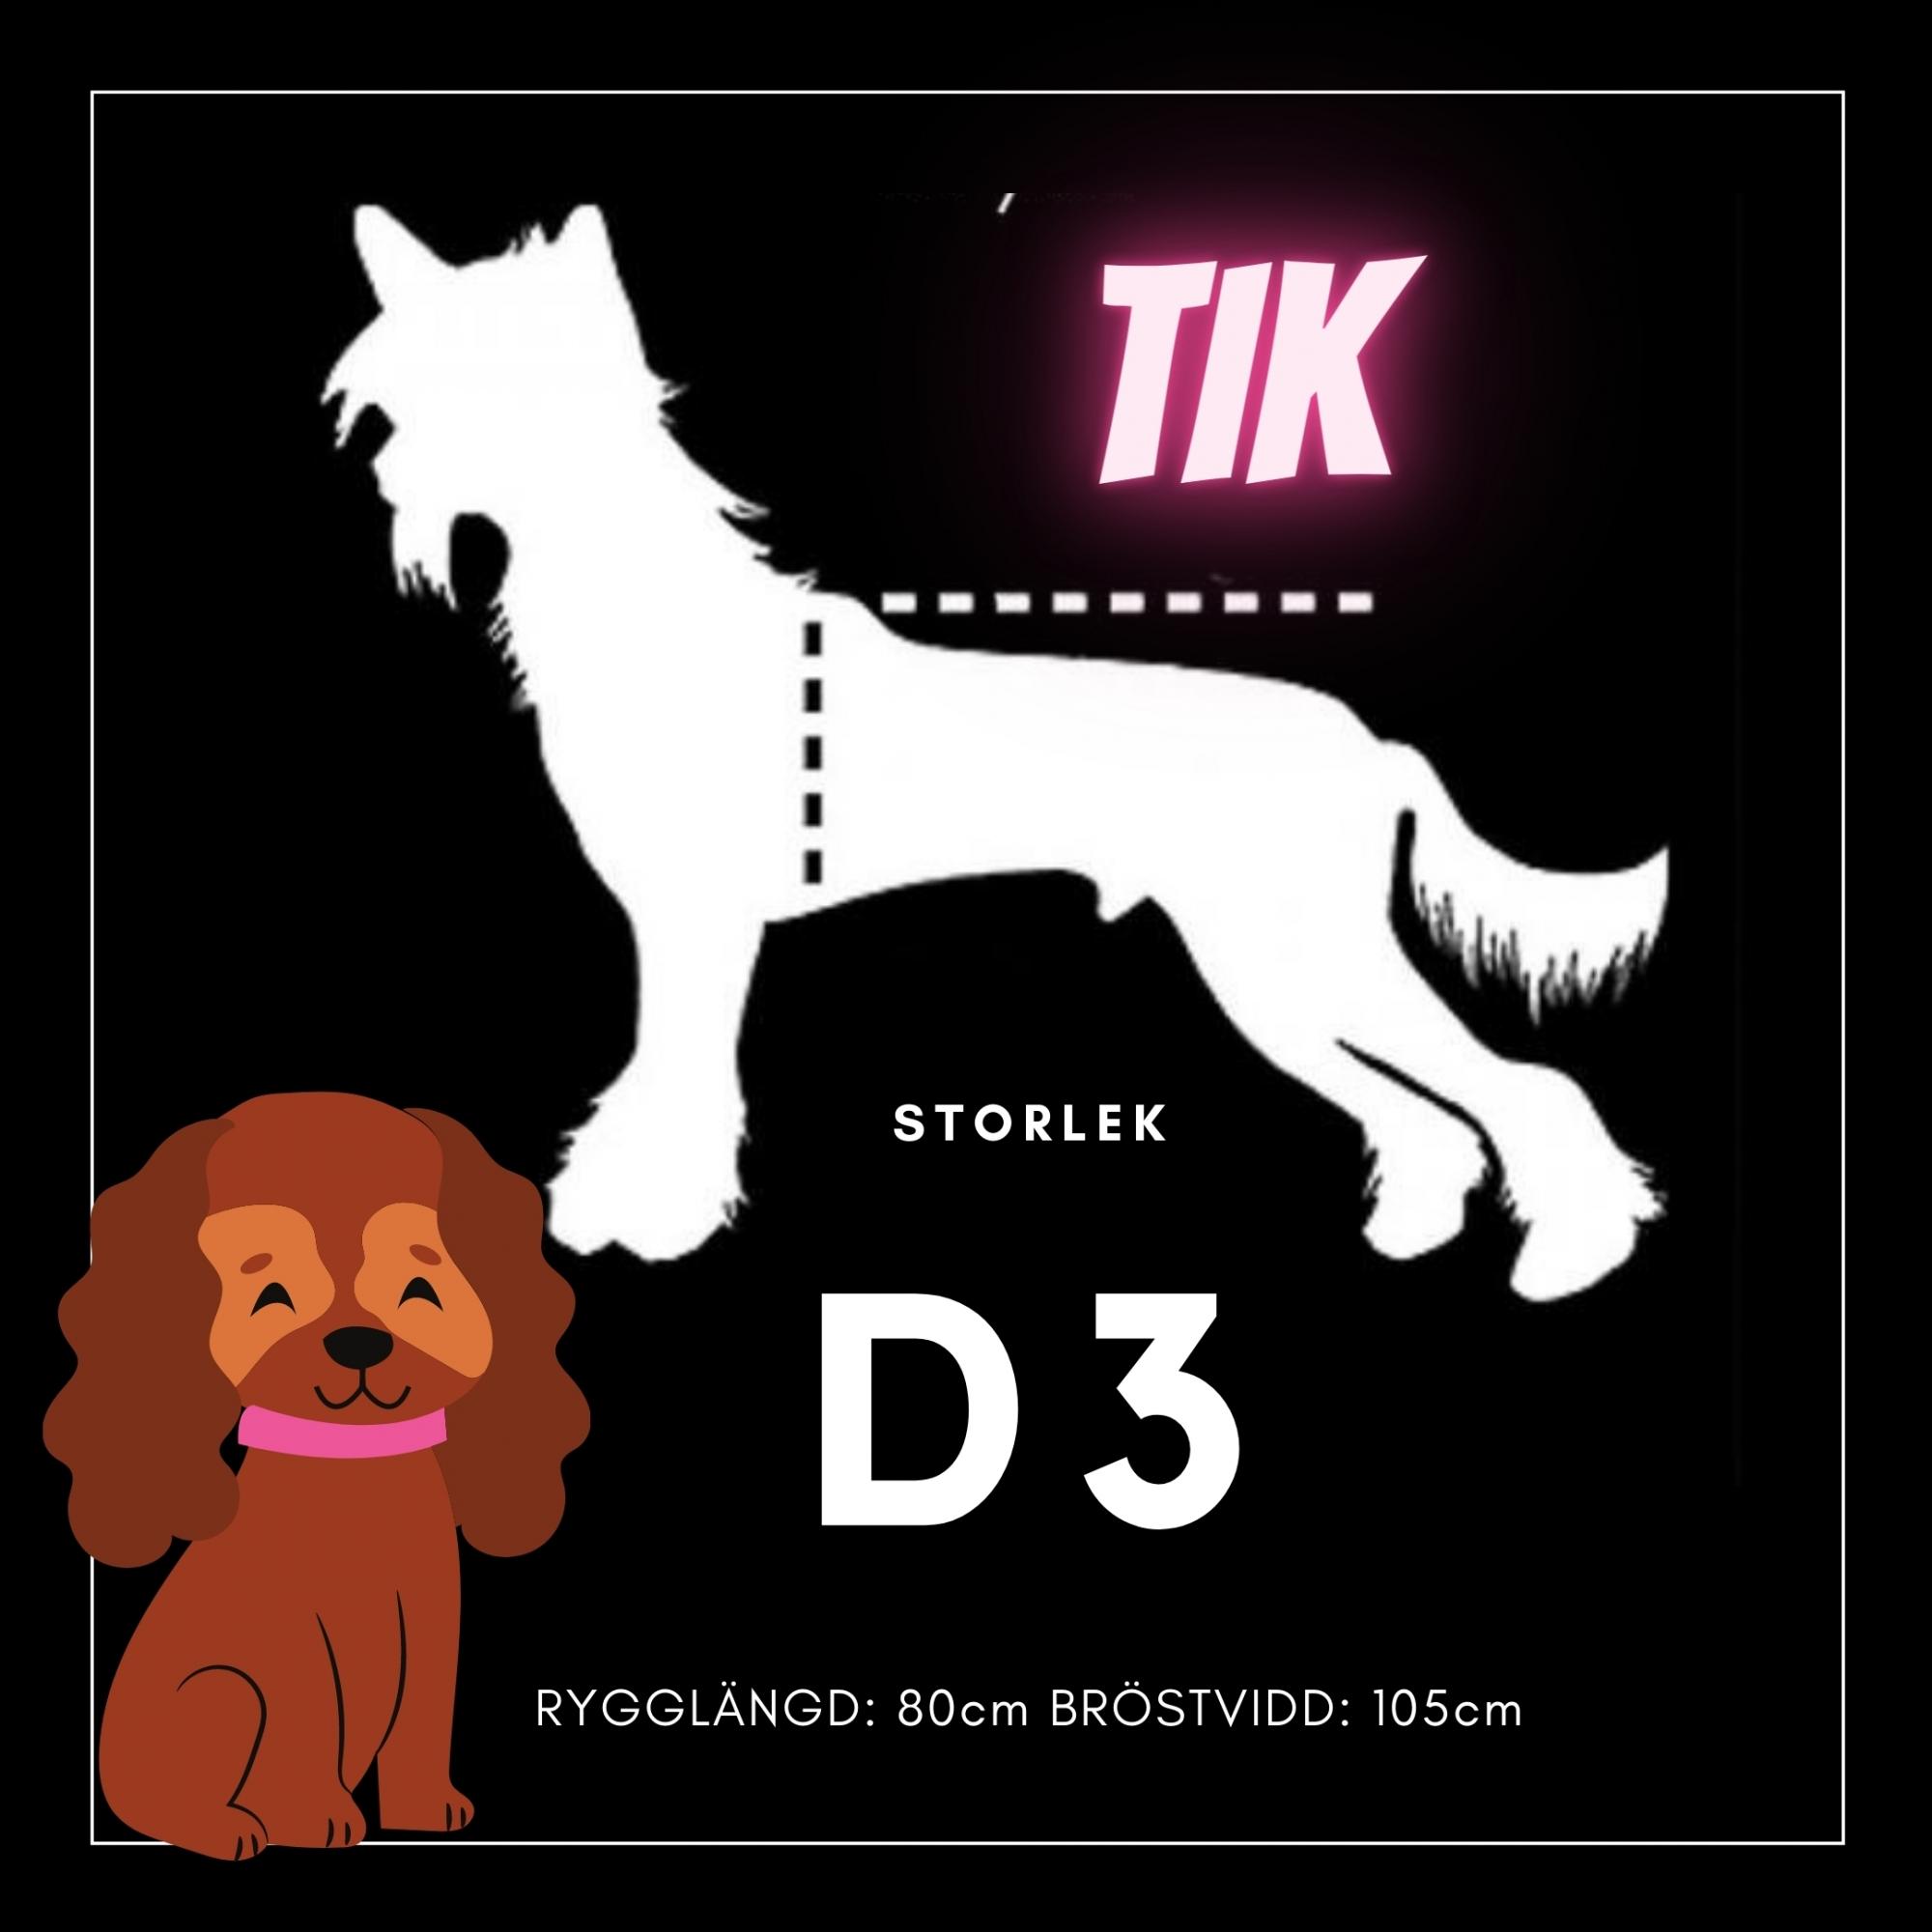 Tik Storlek D3 - Passion For Pet Fashion